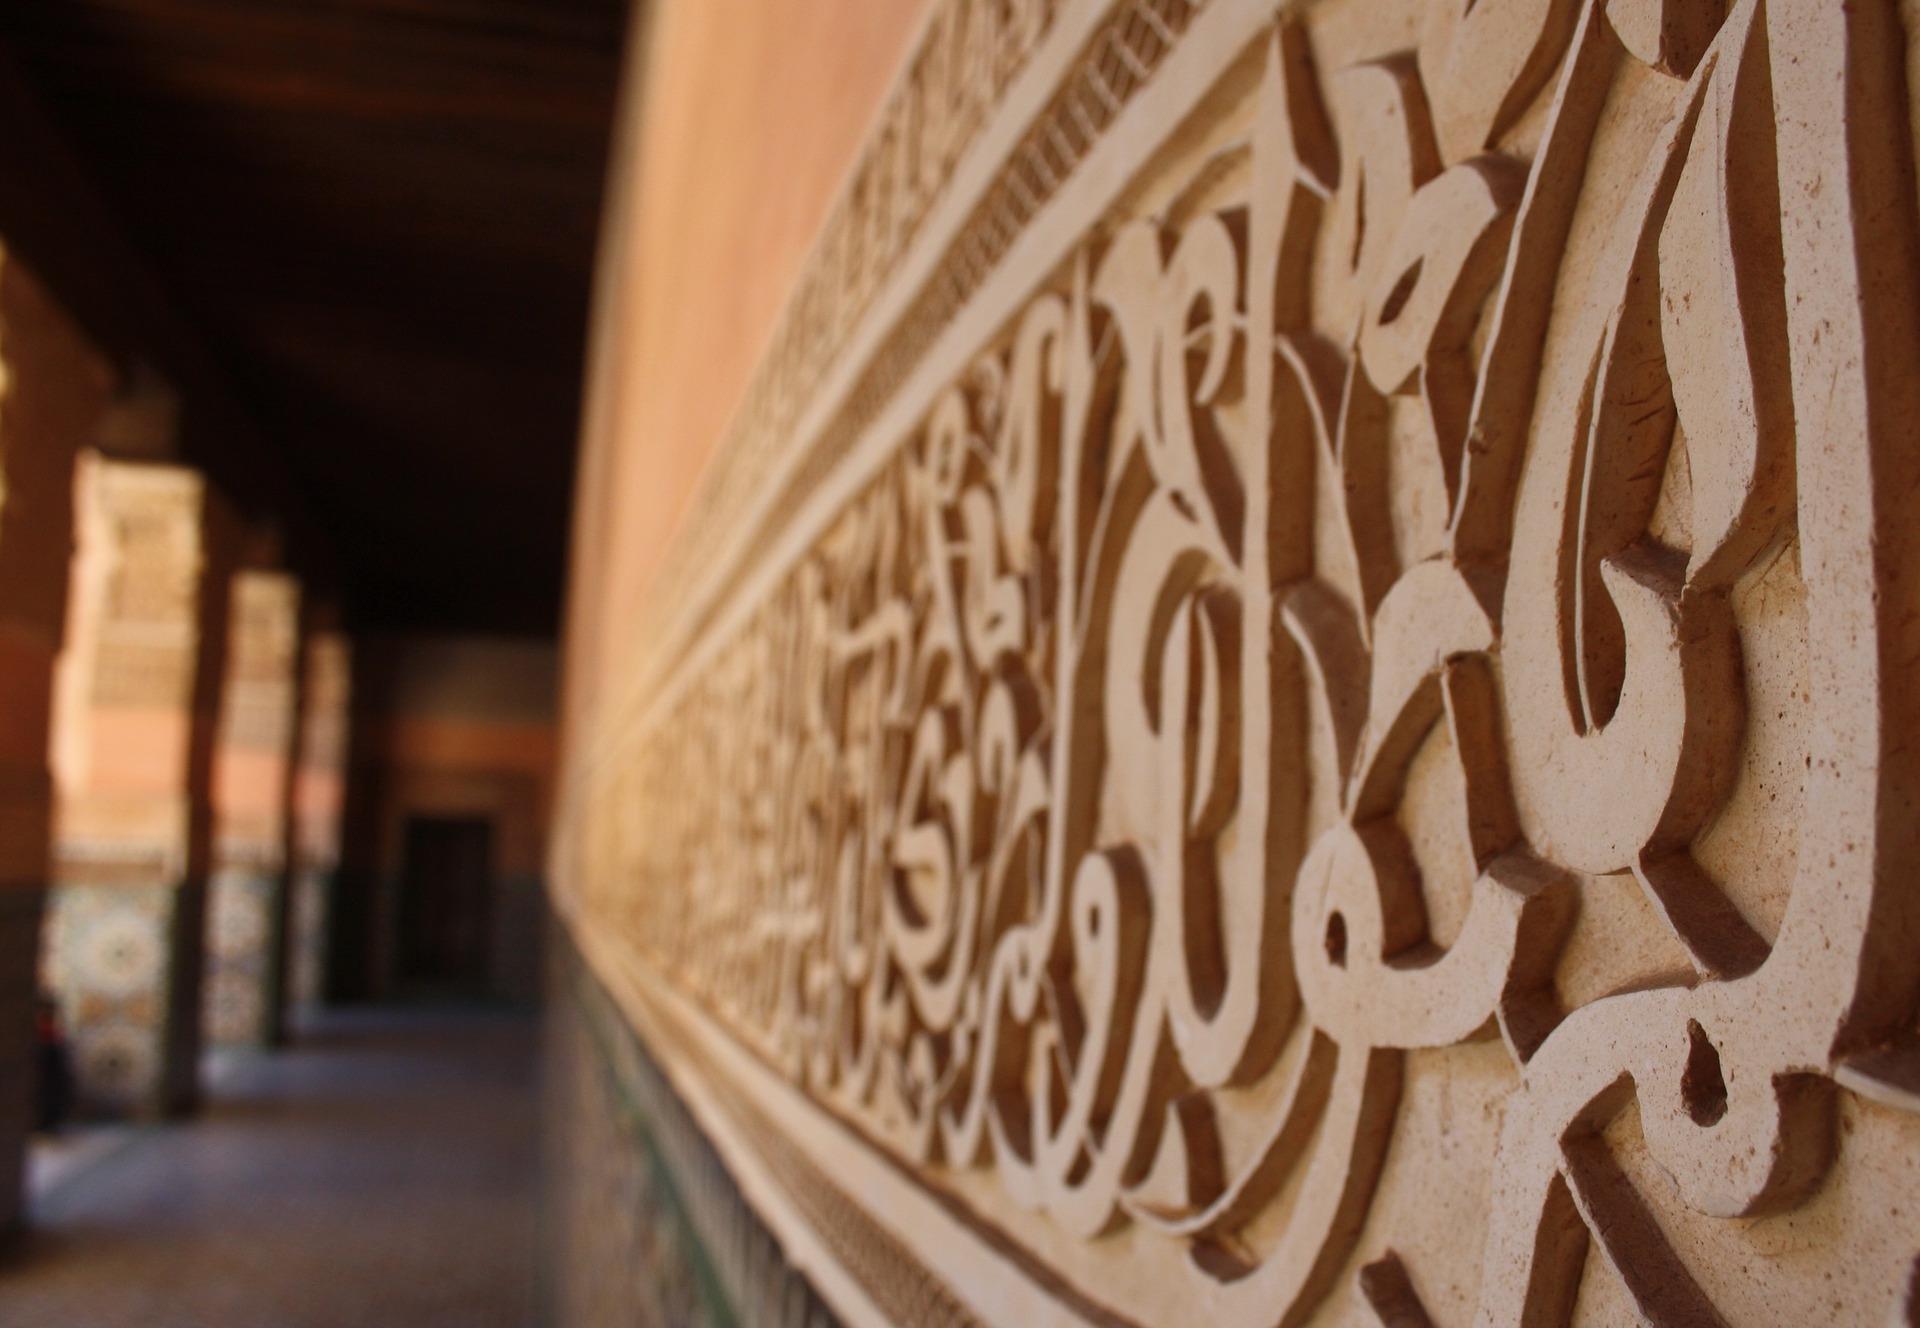 mosque-2816297_1920